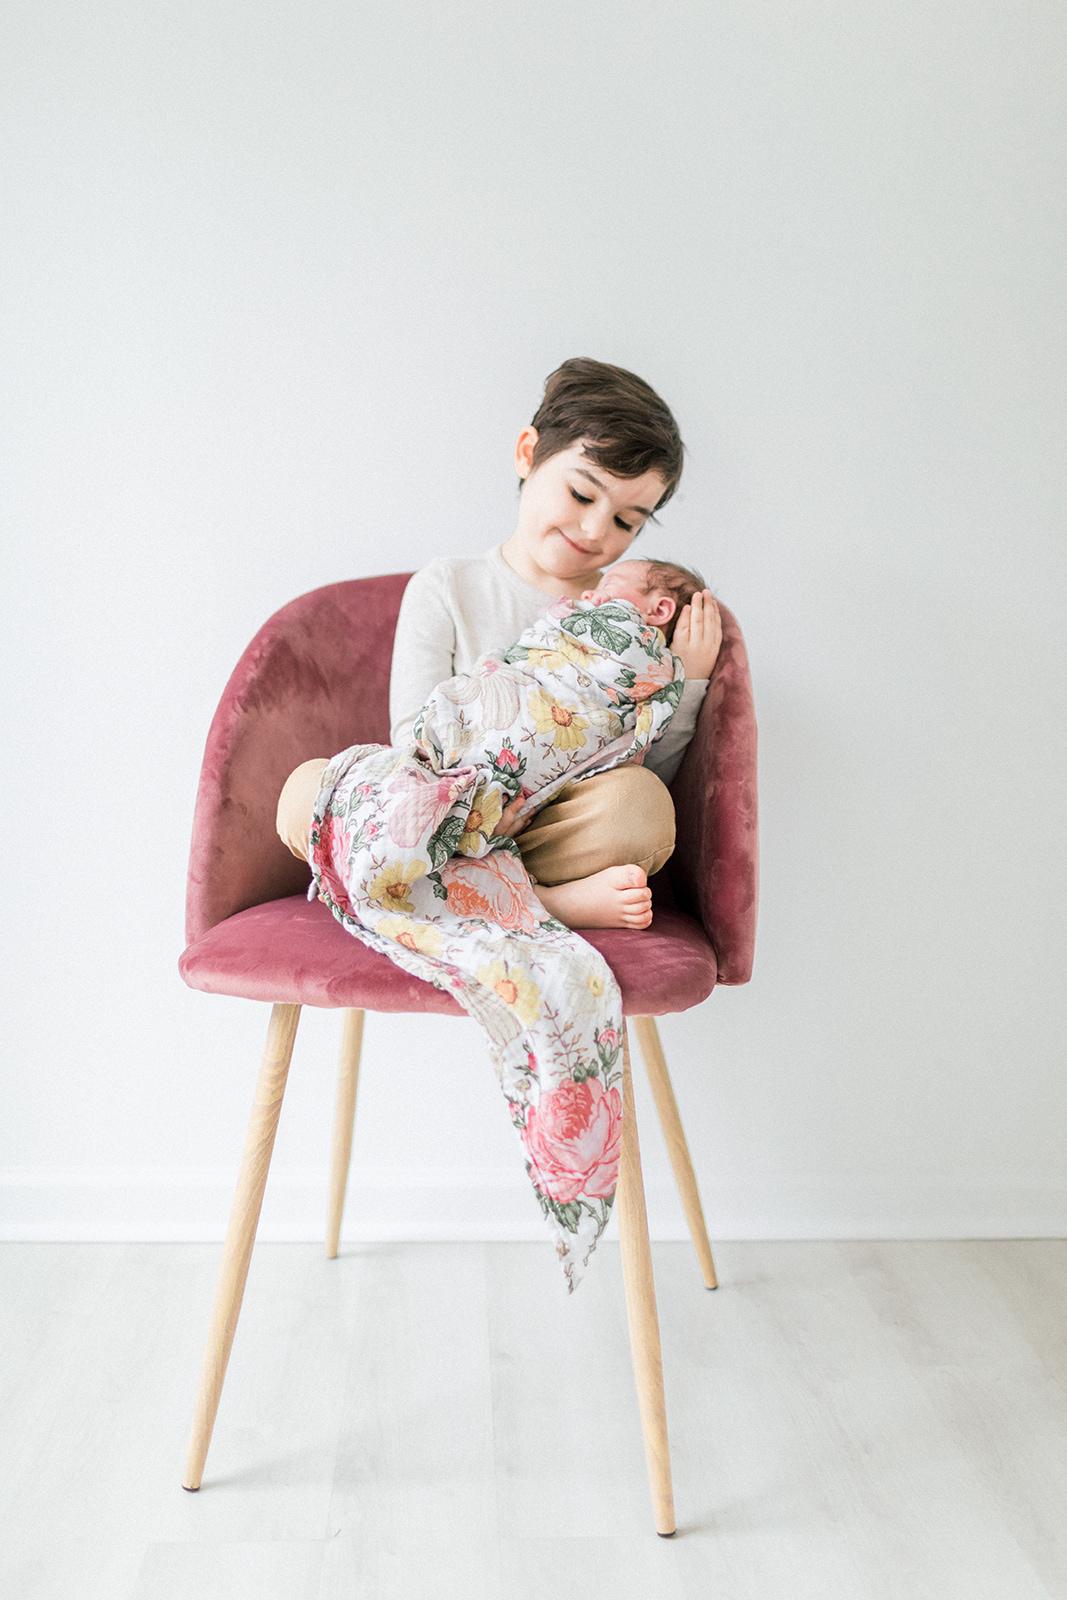 penny nb-10best atlanta newborn photographer maternity photography atlanta newborn photos.jpg